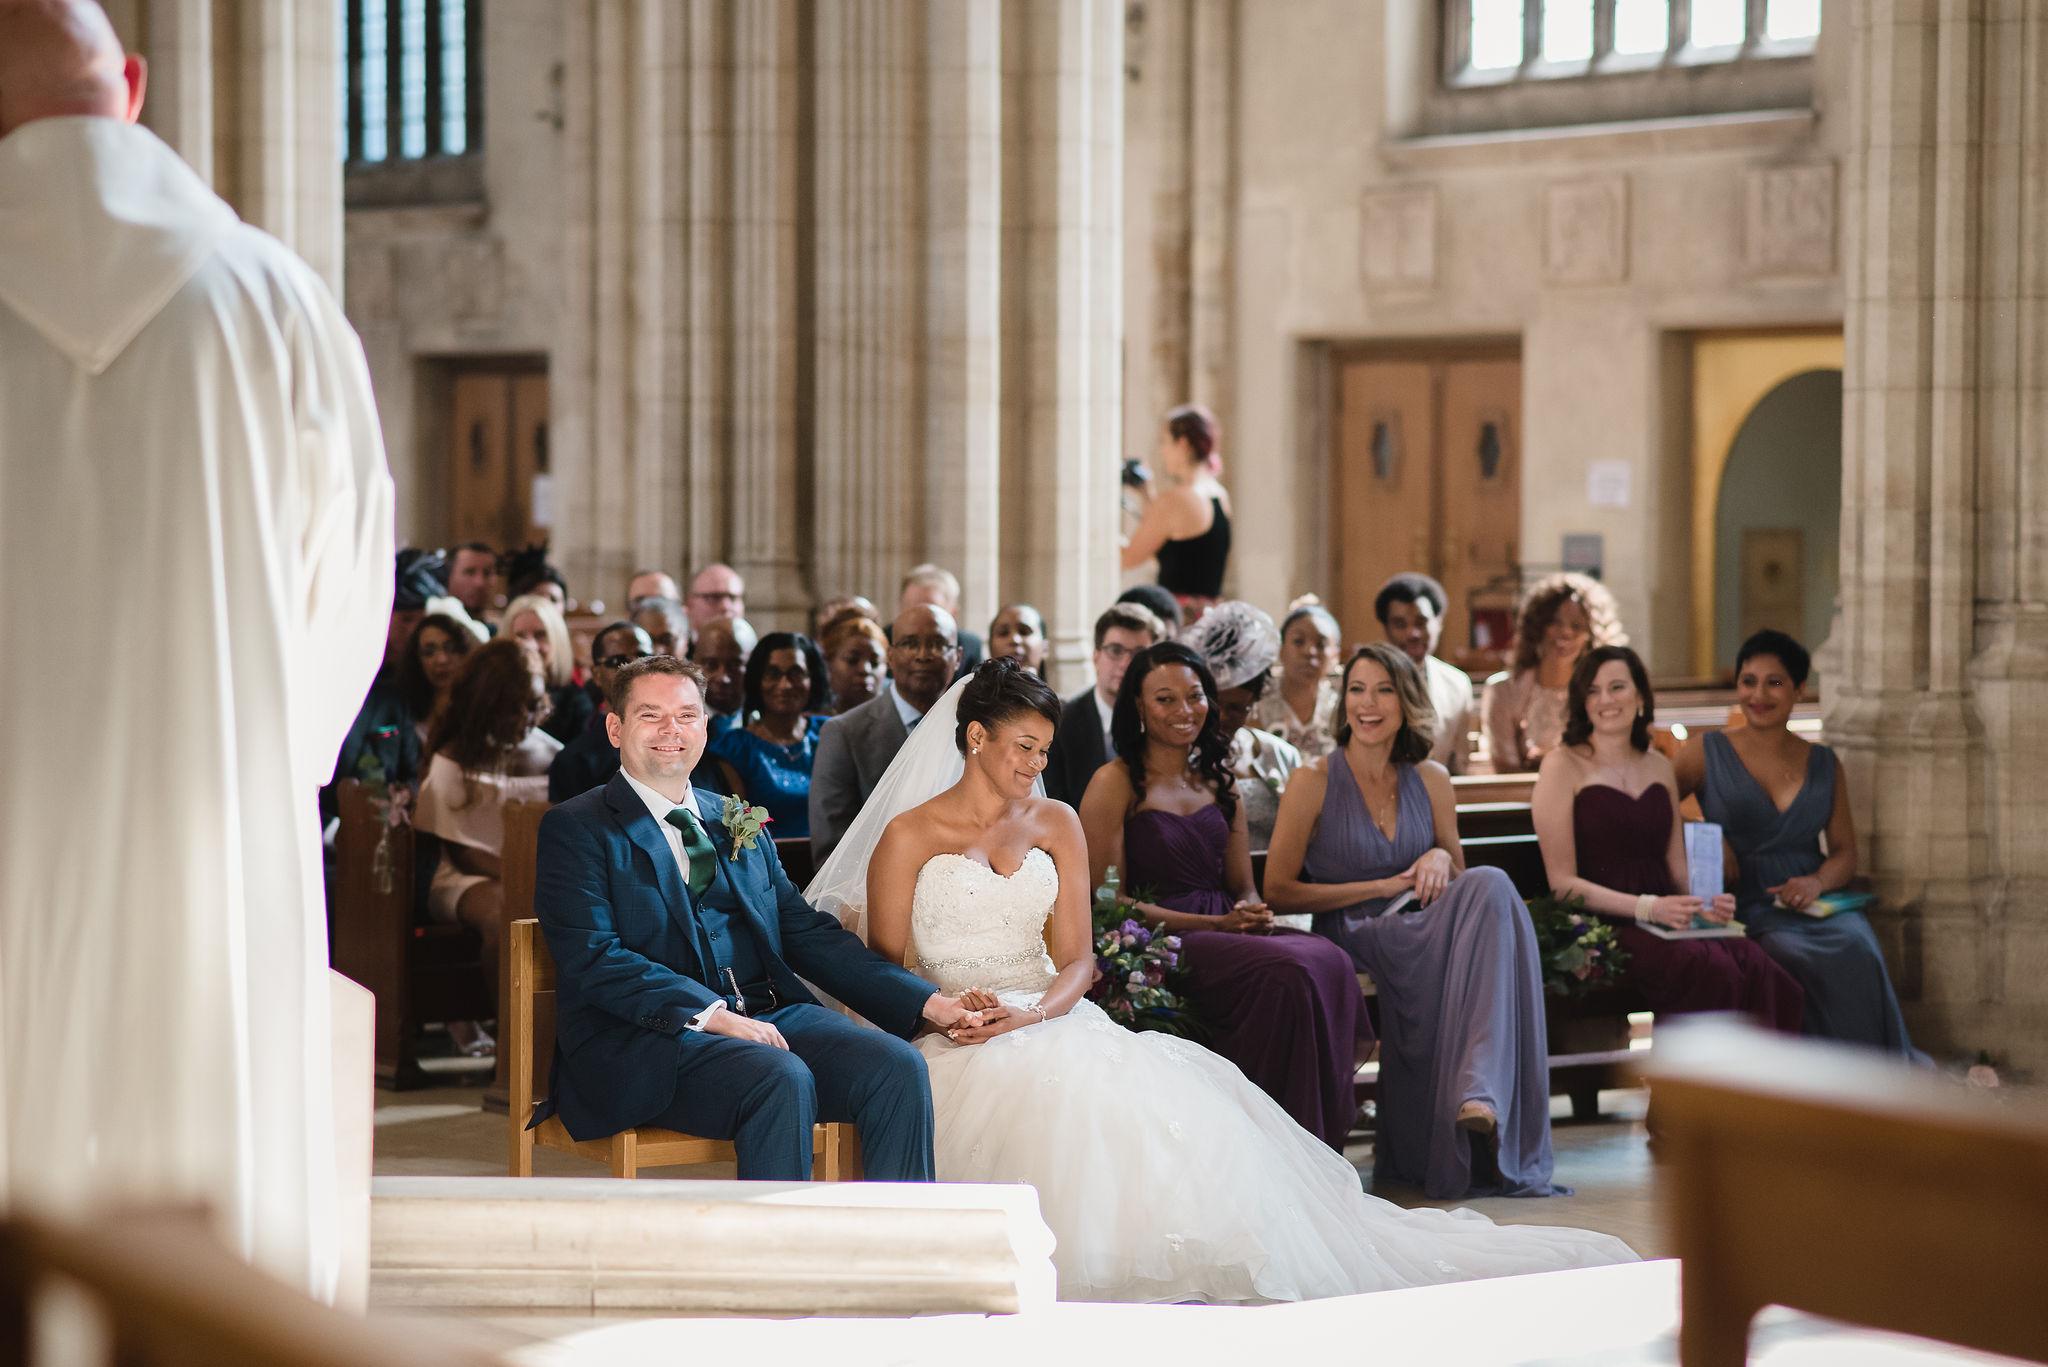 The Anthologist_Drake_and_Morgan_London_Wedding_46.jpg